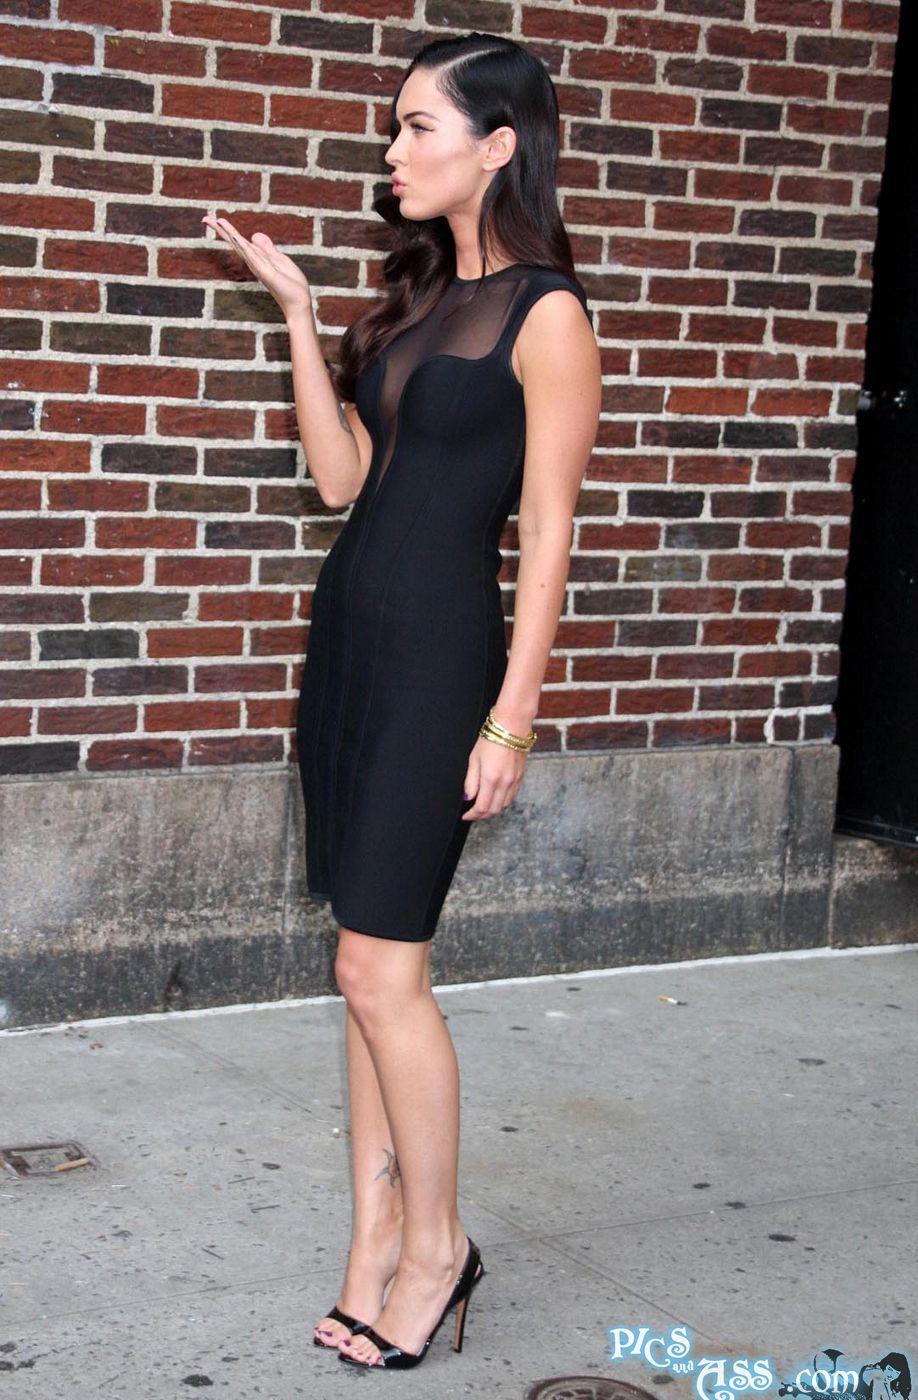 Amy Adams Wikifeet megan fox feet | feeture - sexy womens feet